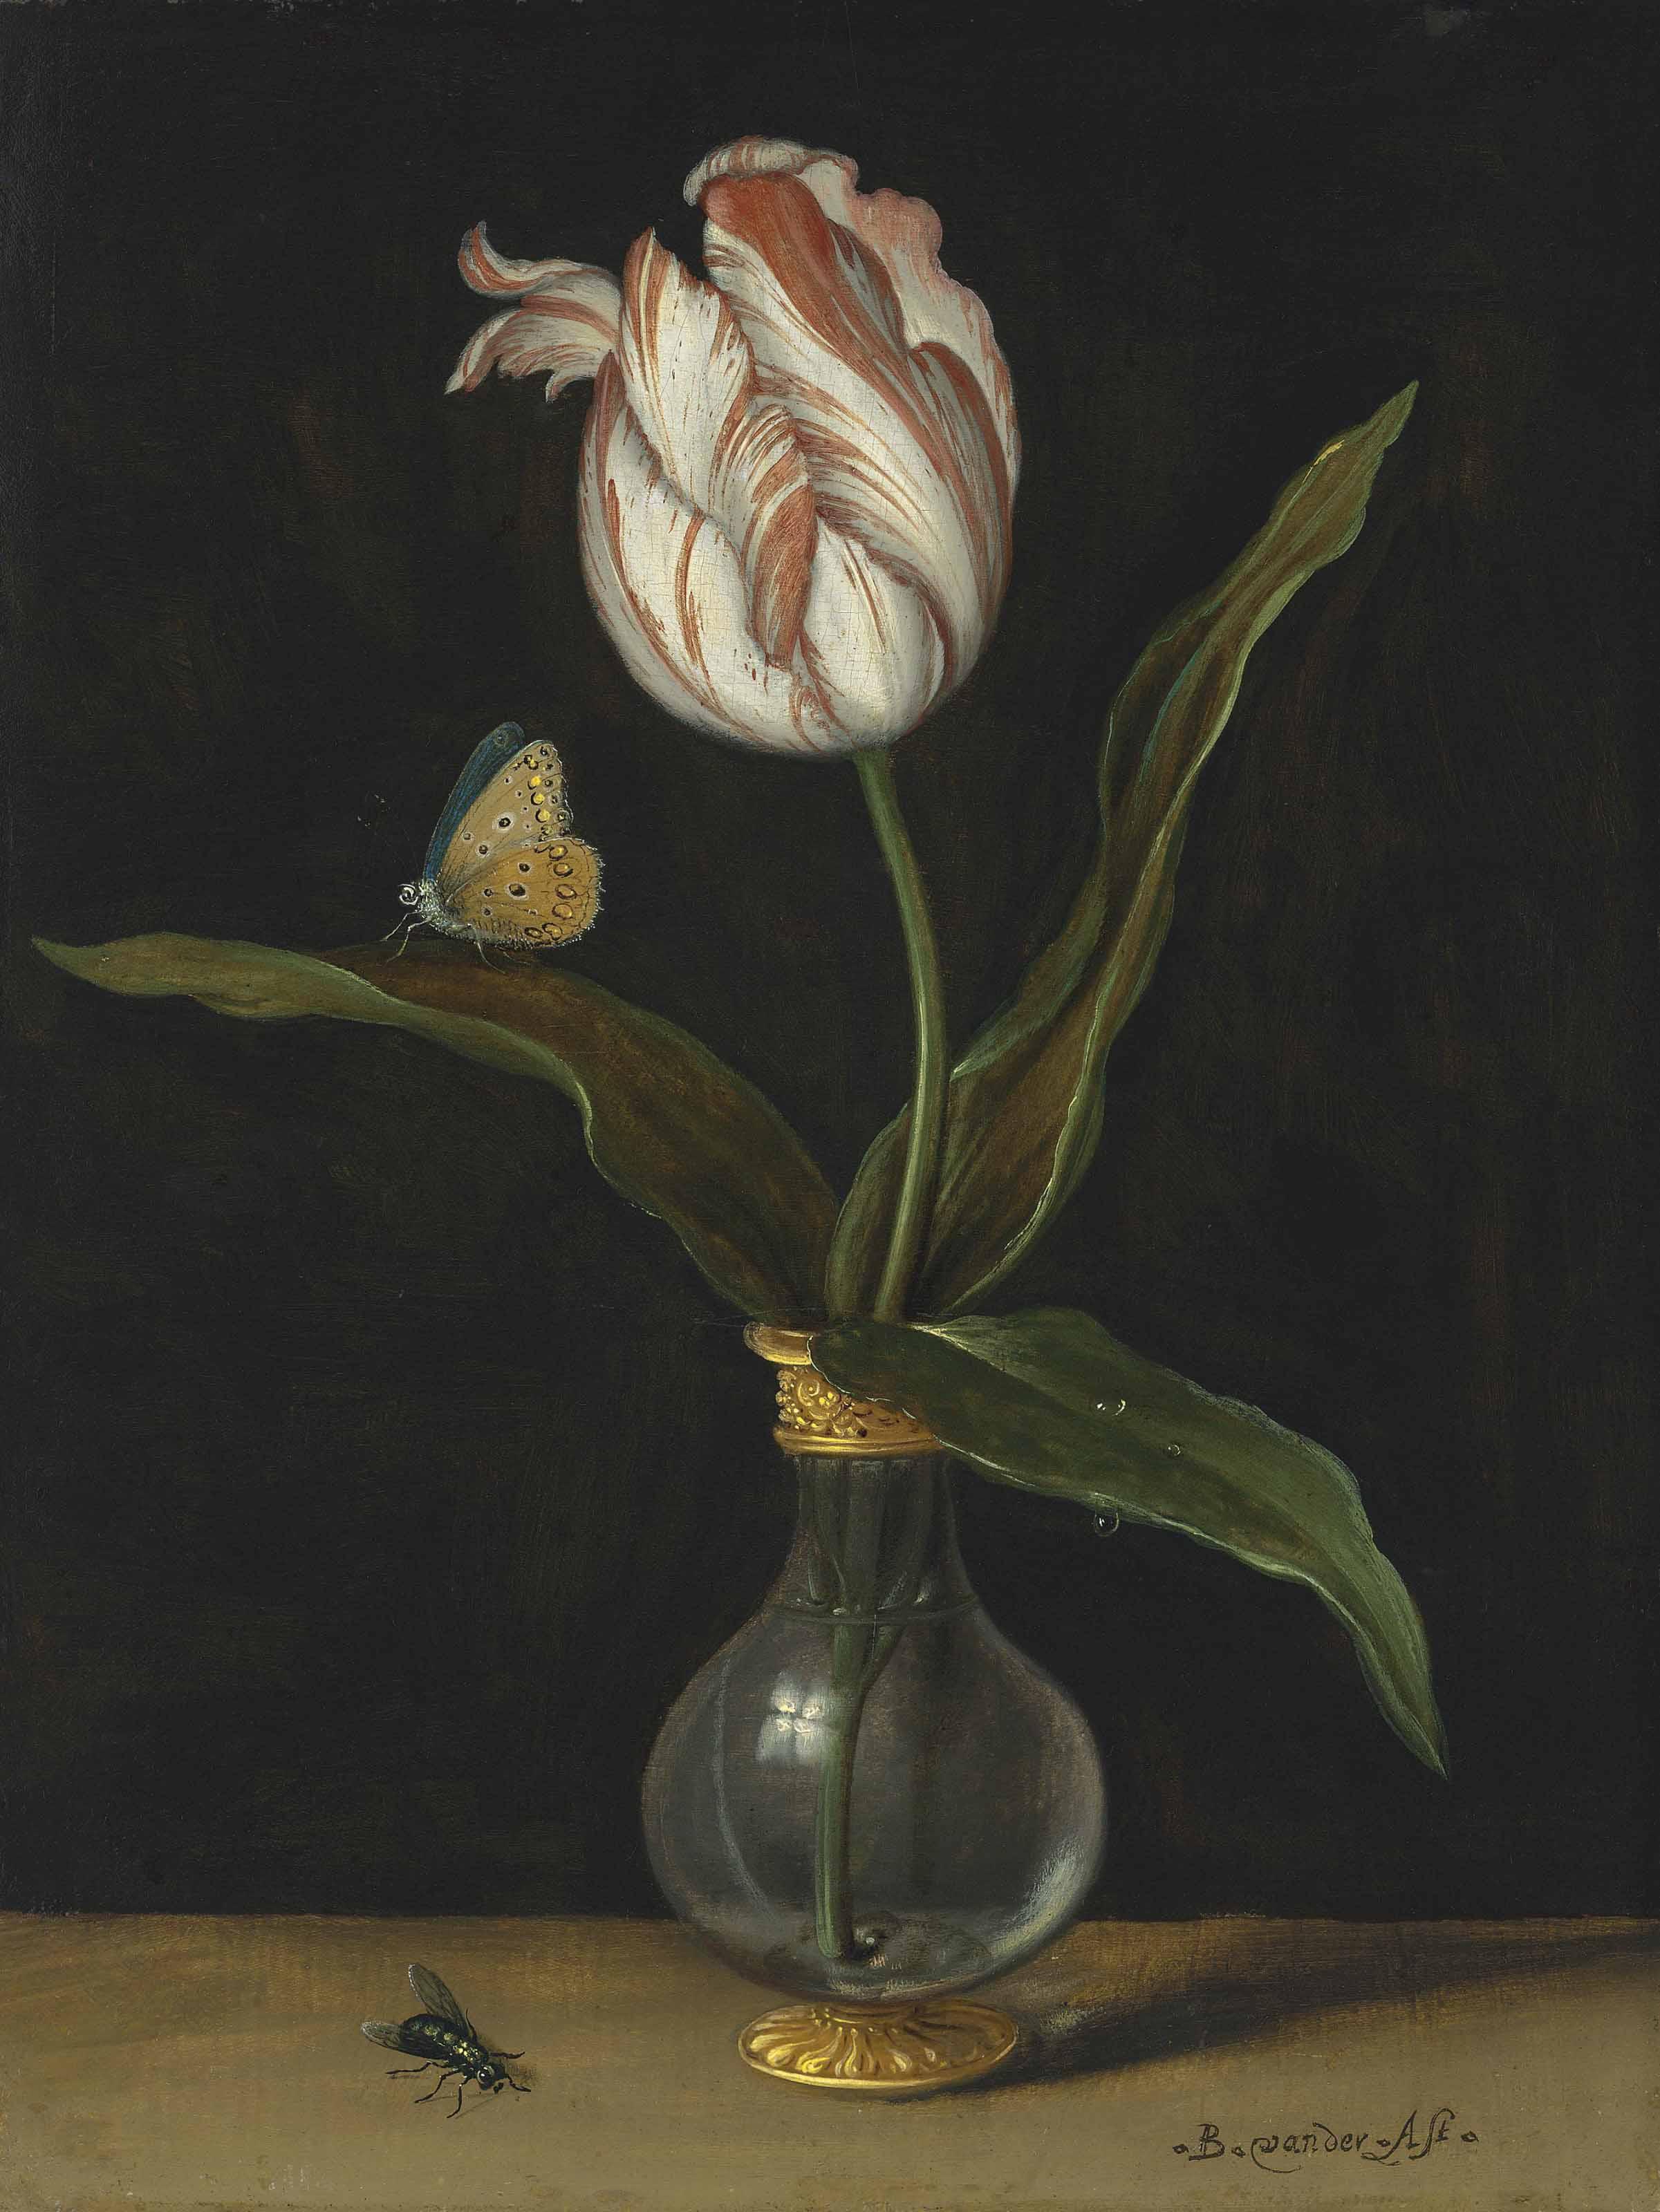 The 'Zomerschoon' tulip